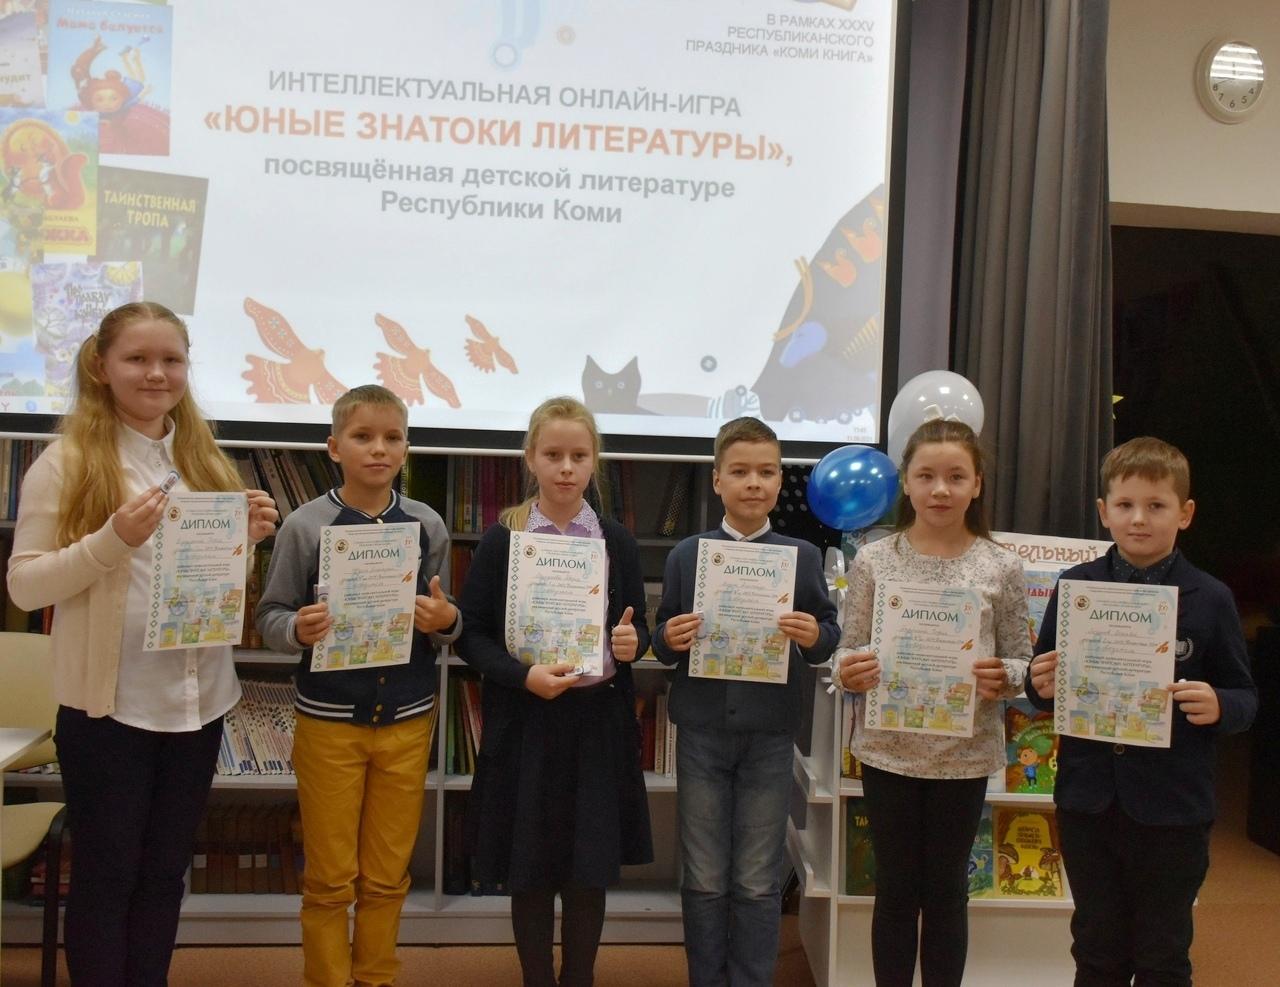 КОМИ КНИГА - праздник литературы и творчества!